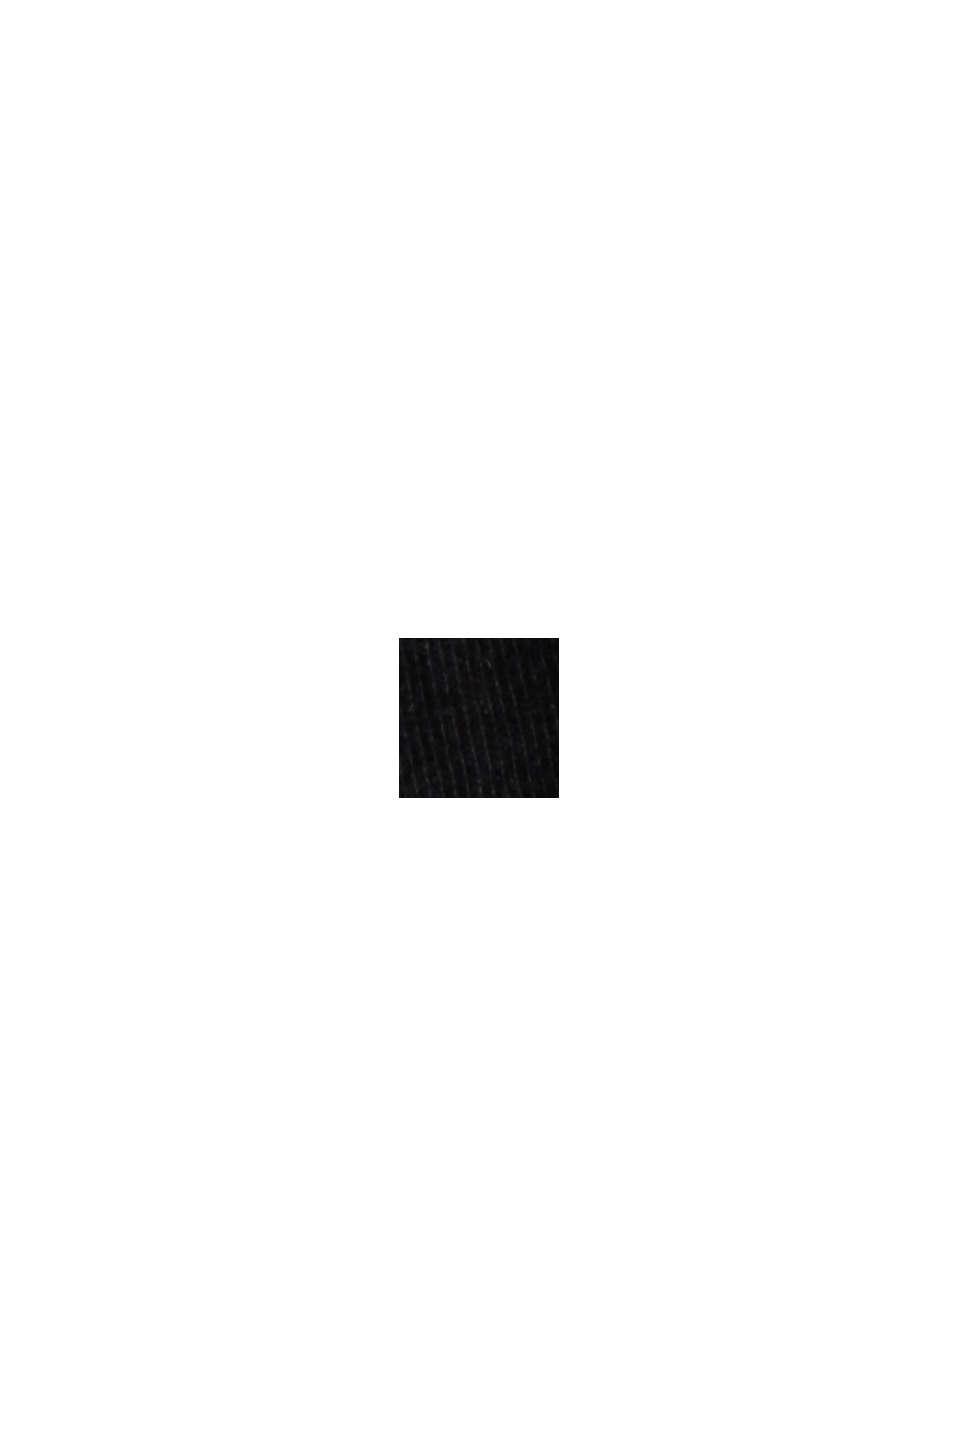 Maglia da pigiama vellutata, 100% cotone biologico, BLACK, swatch